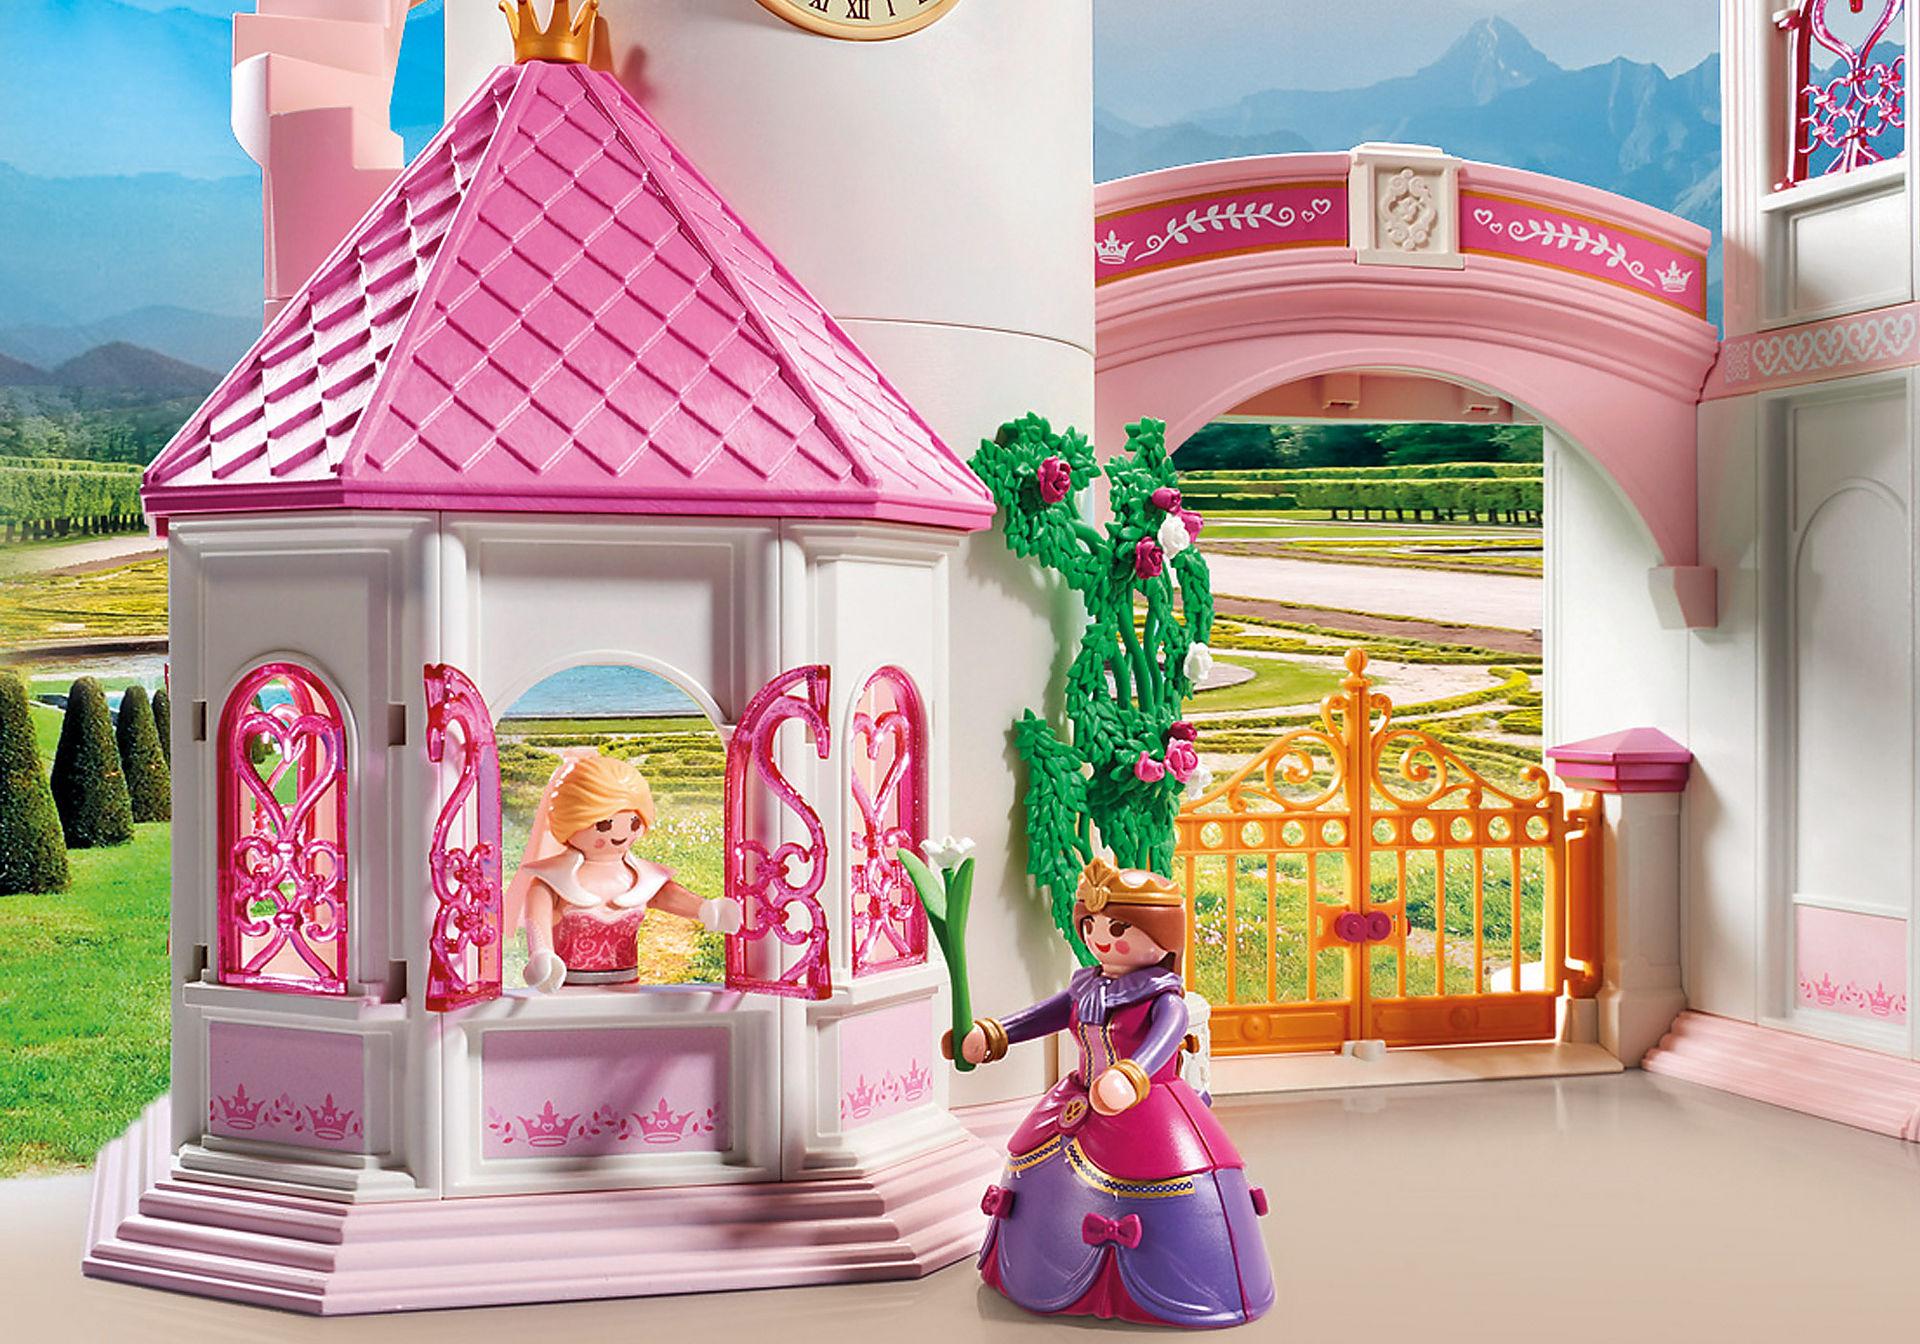 70447 Large Princess Castle zoom image5